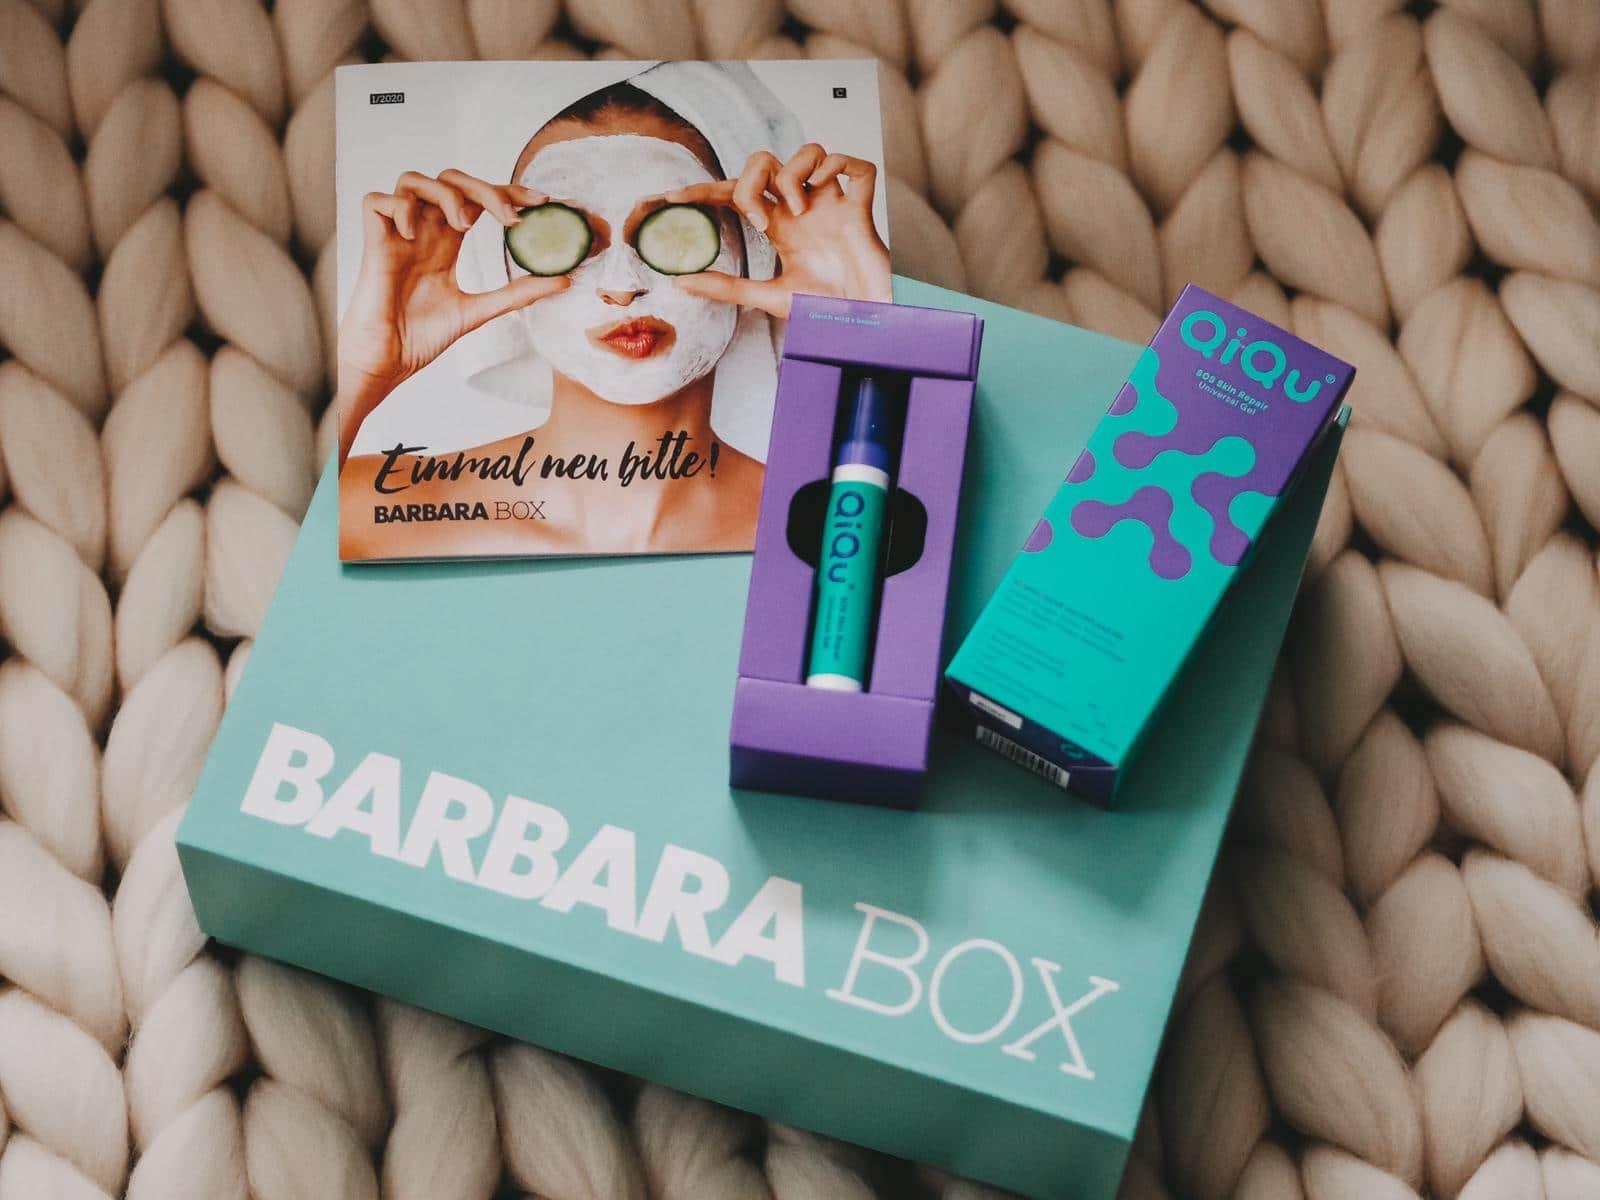 QuiQu Hautgel aus der Barbara Box Einmal neu bitte